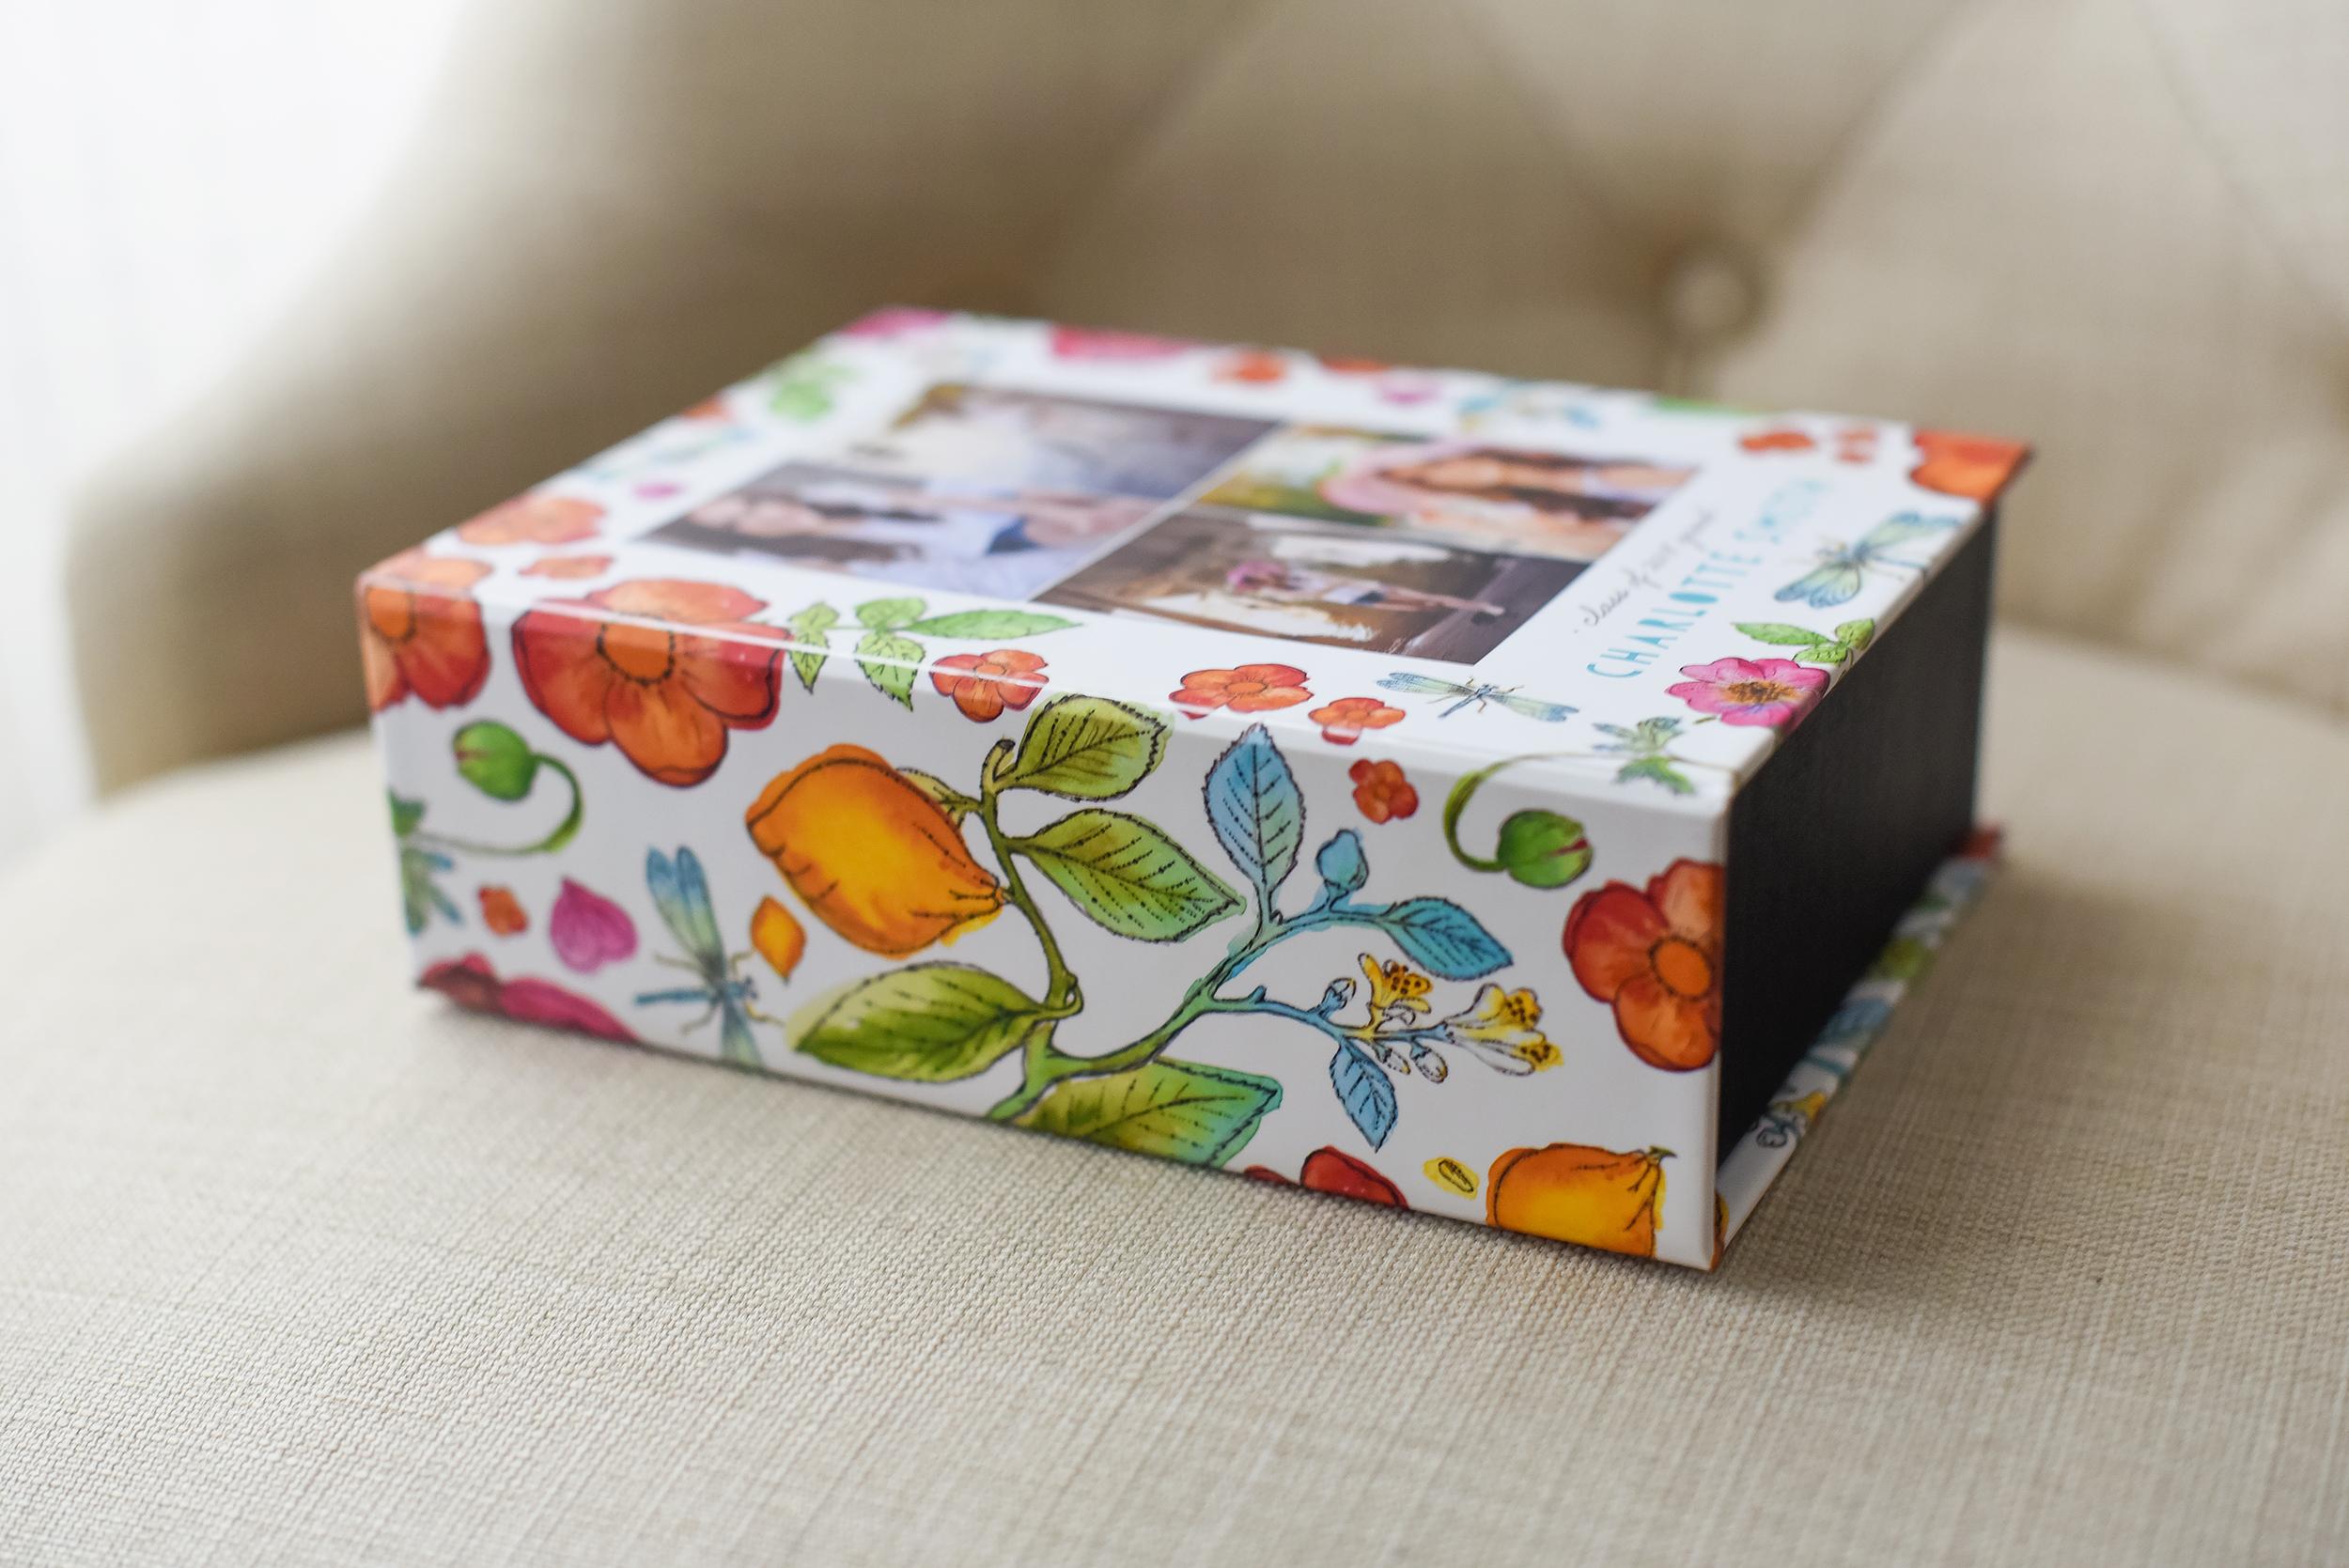 Handmade photo gifts and keepsakes